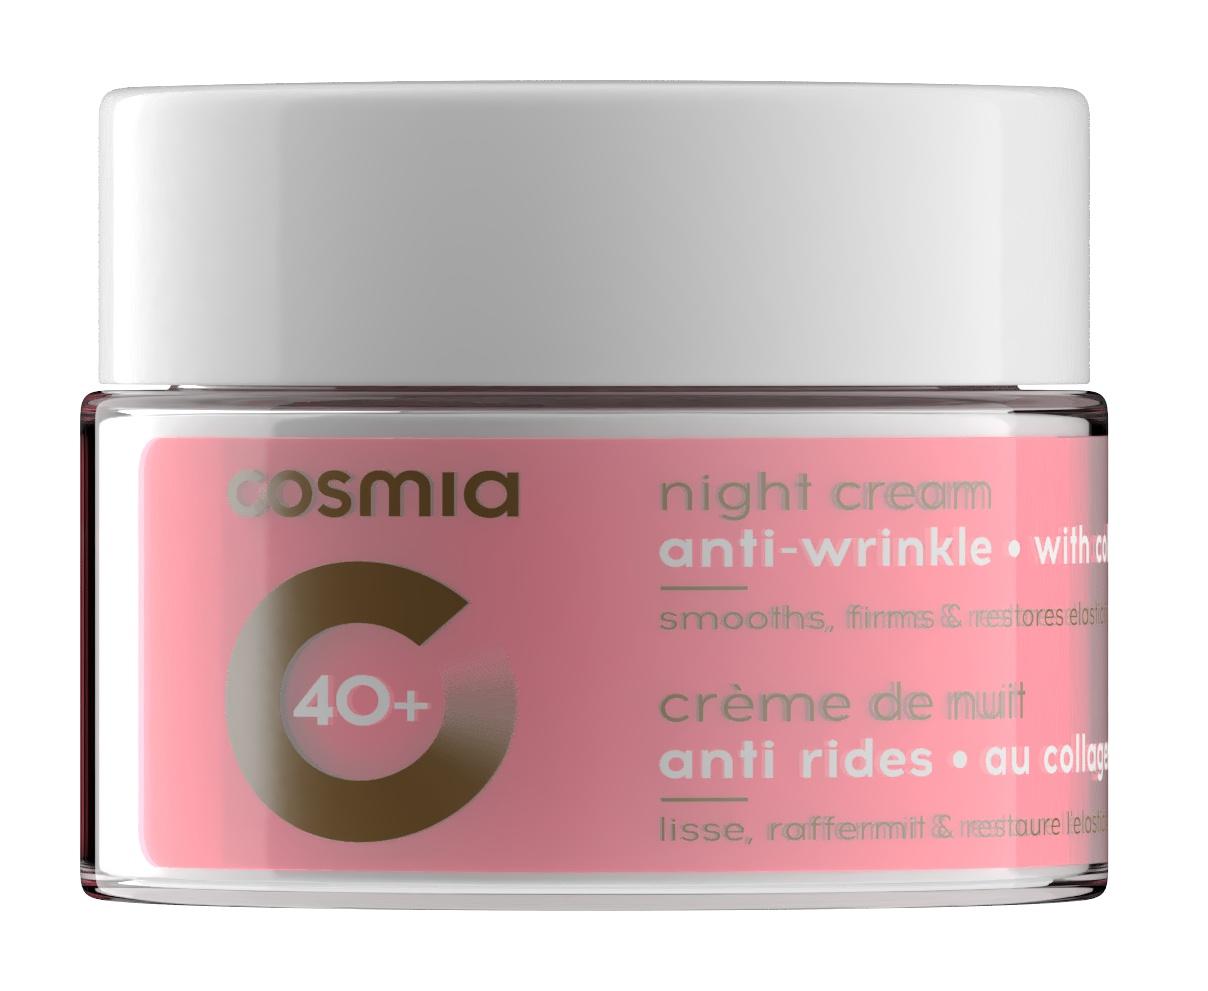 Cosmia 40+ Anti-Wrinkle Night Cream